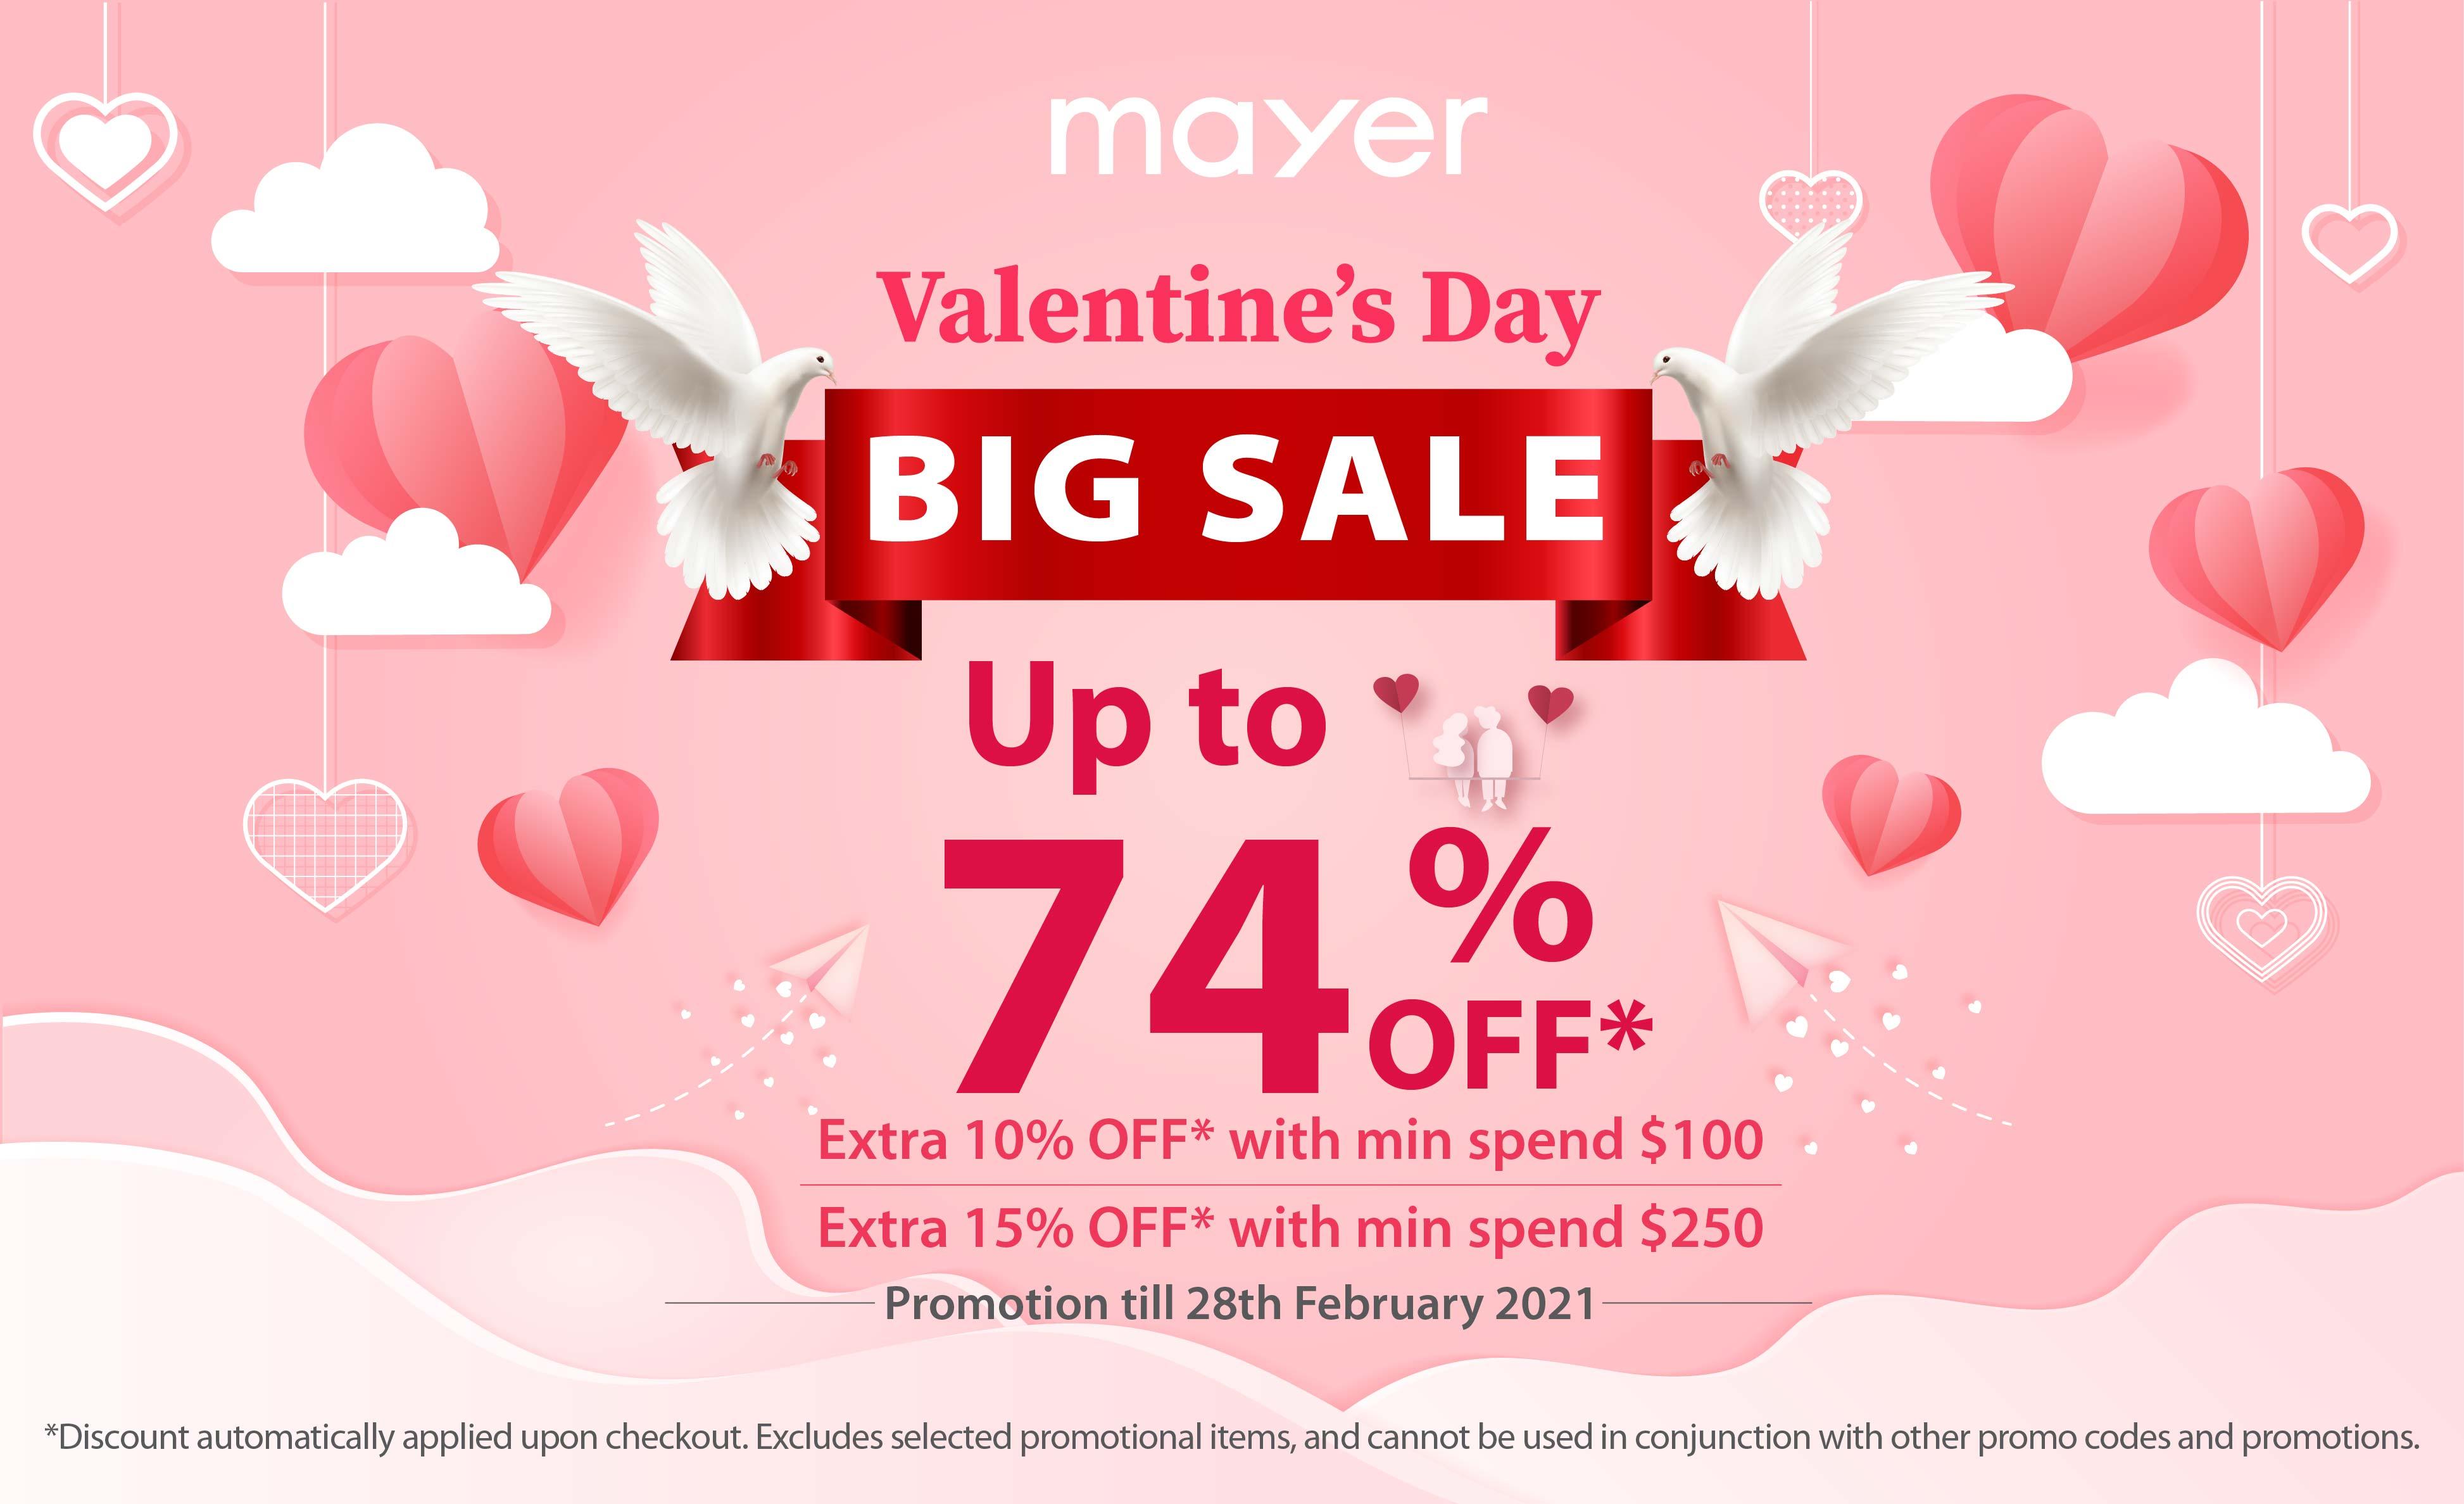 ❤️ Post-Valentine's Sale! ❤️